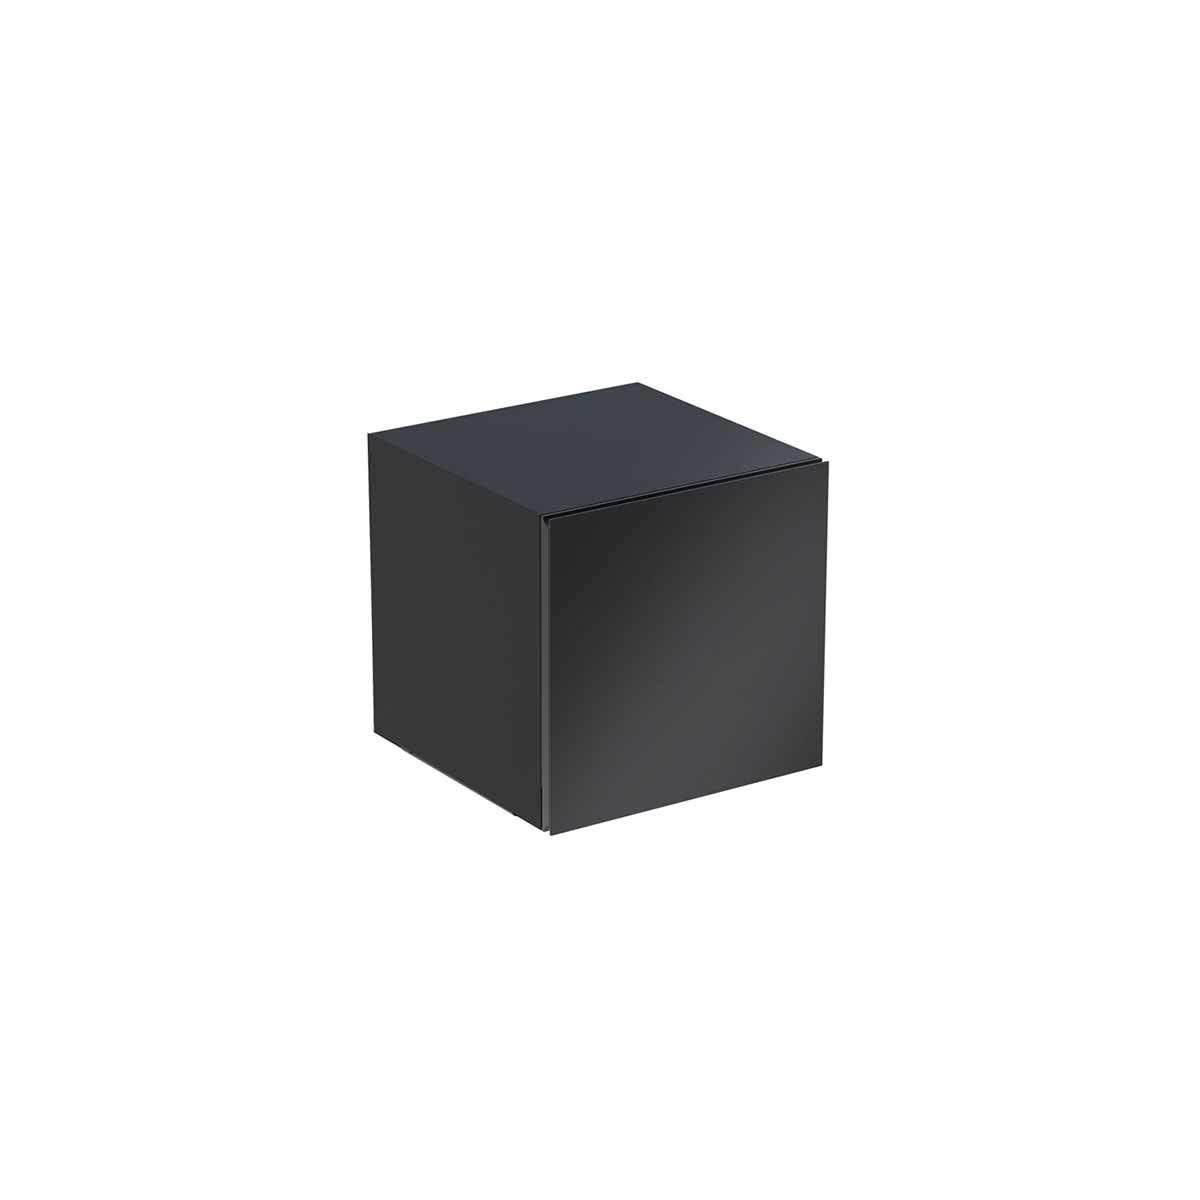 BDI Semblance 15010 Single-width Cabinet